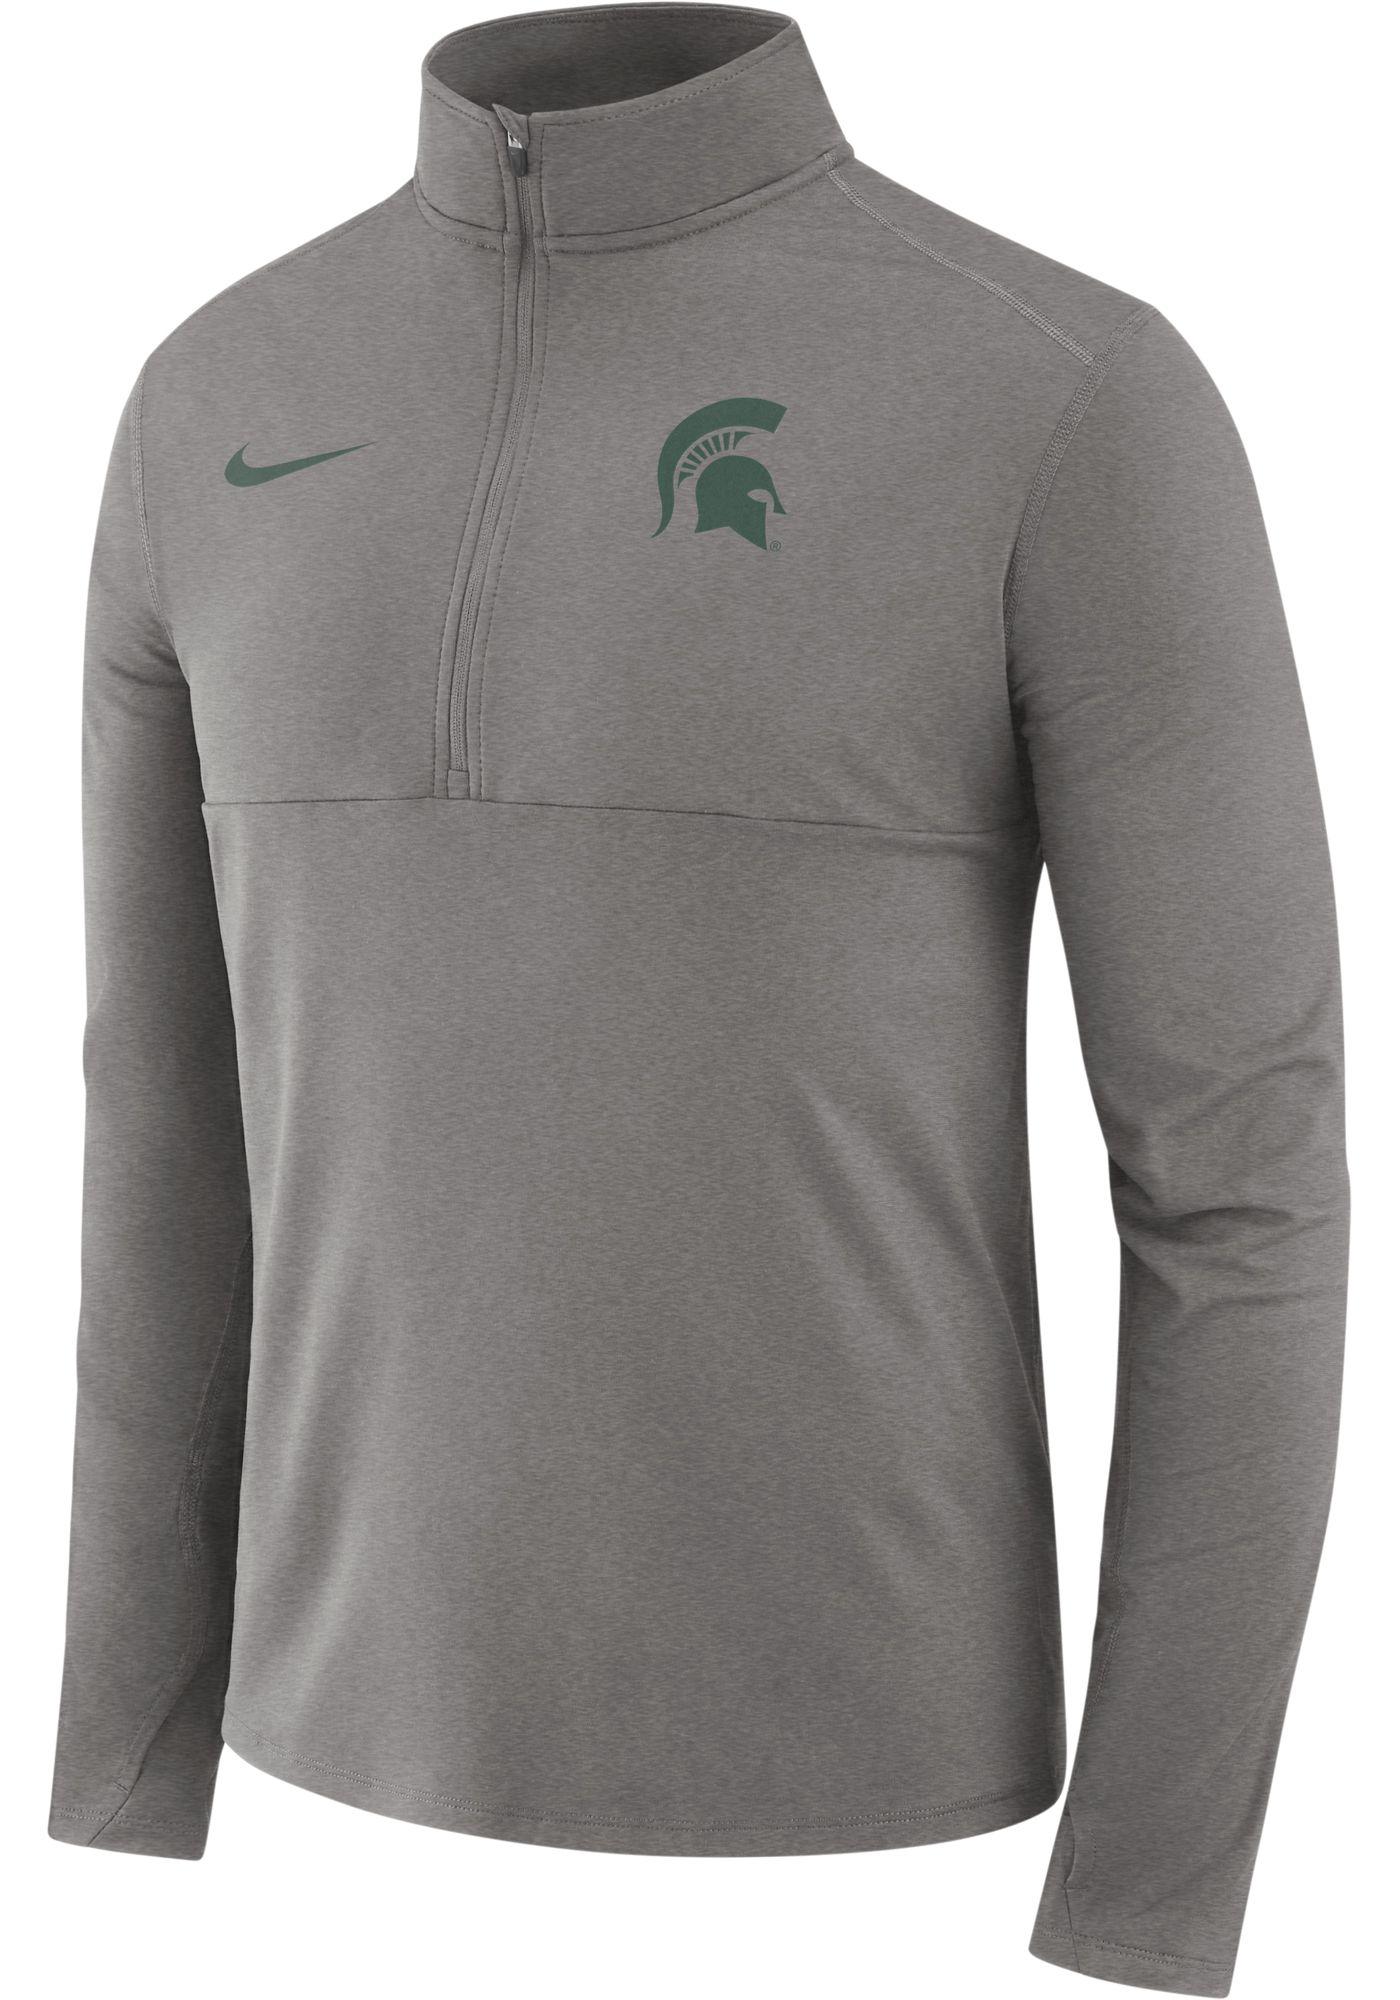 Nike Men's Michigan State Spartans Grey Long Sleeve Core Half-Zip Shirt